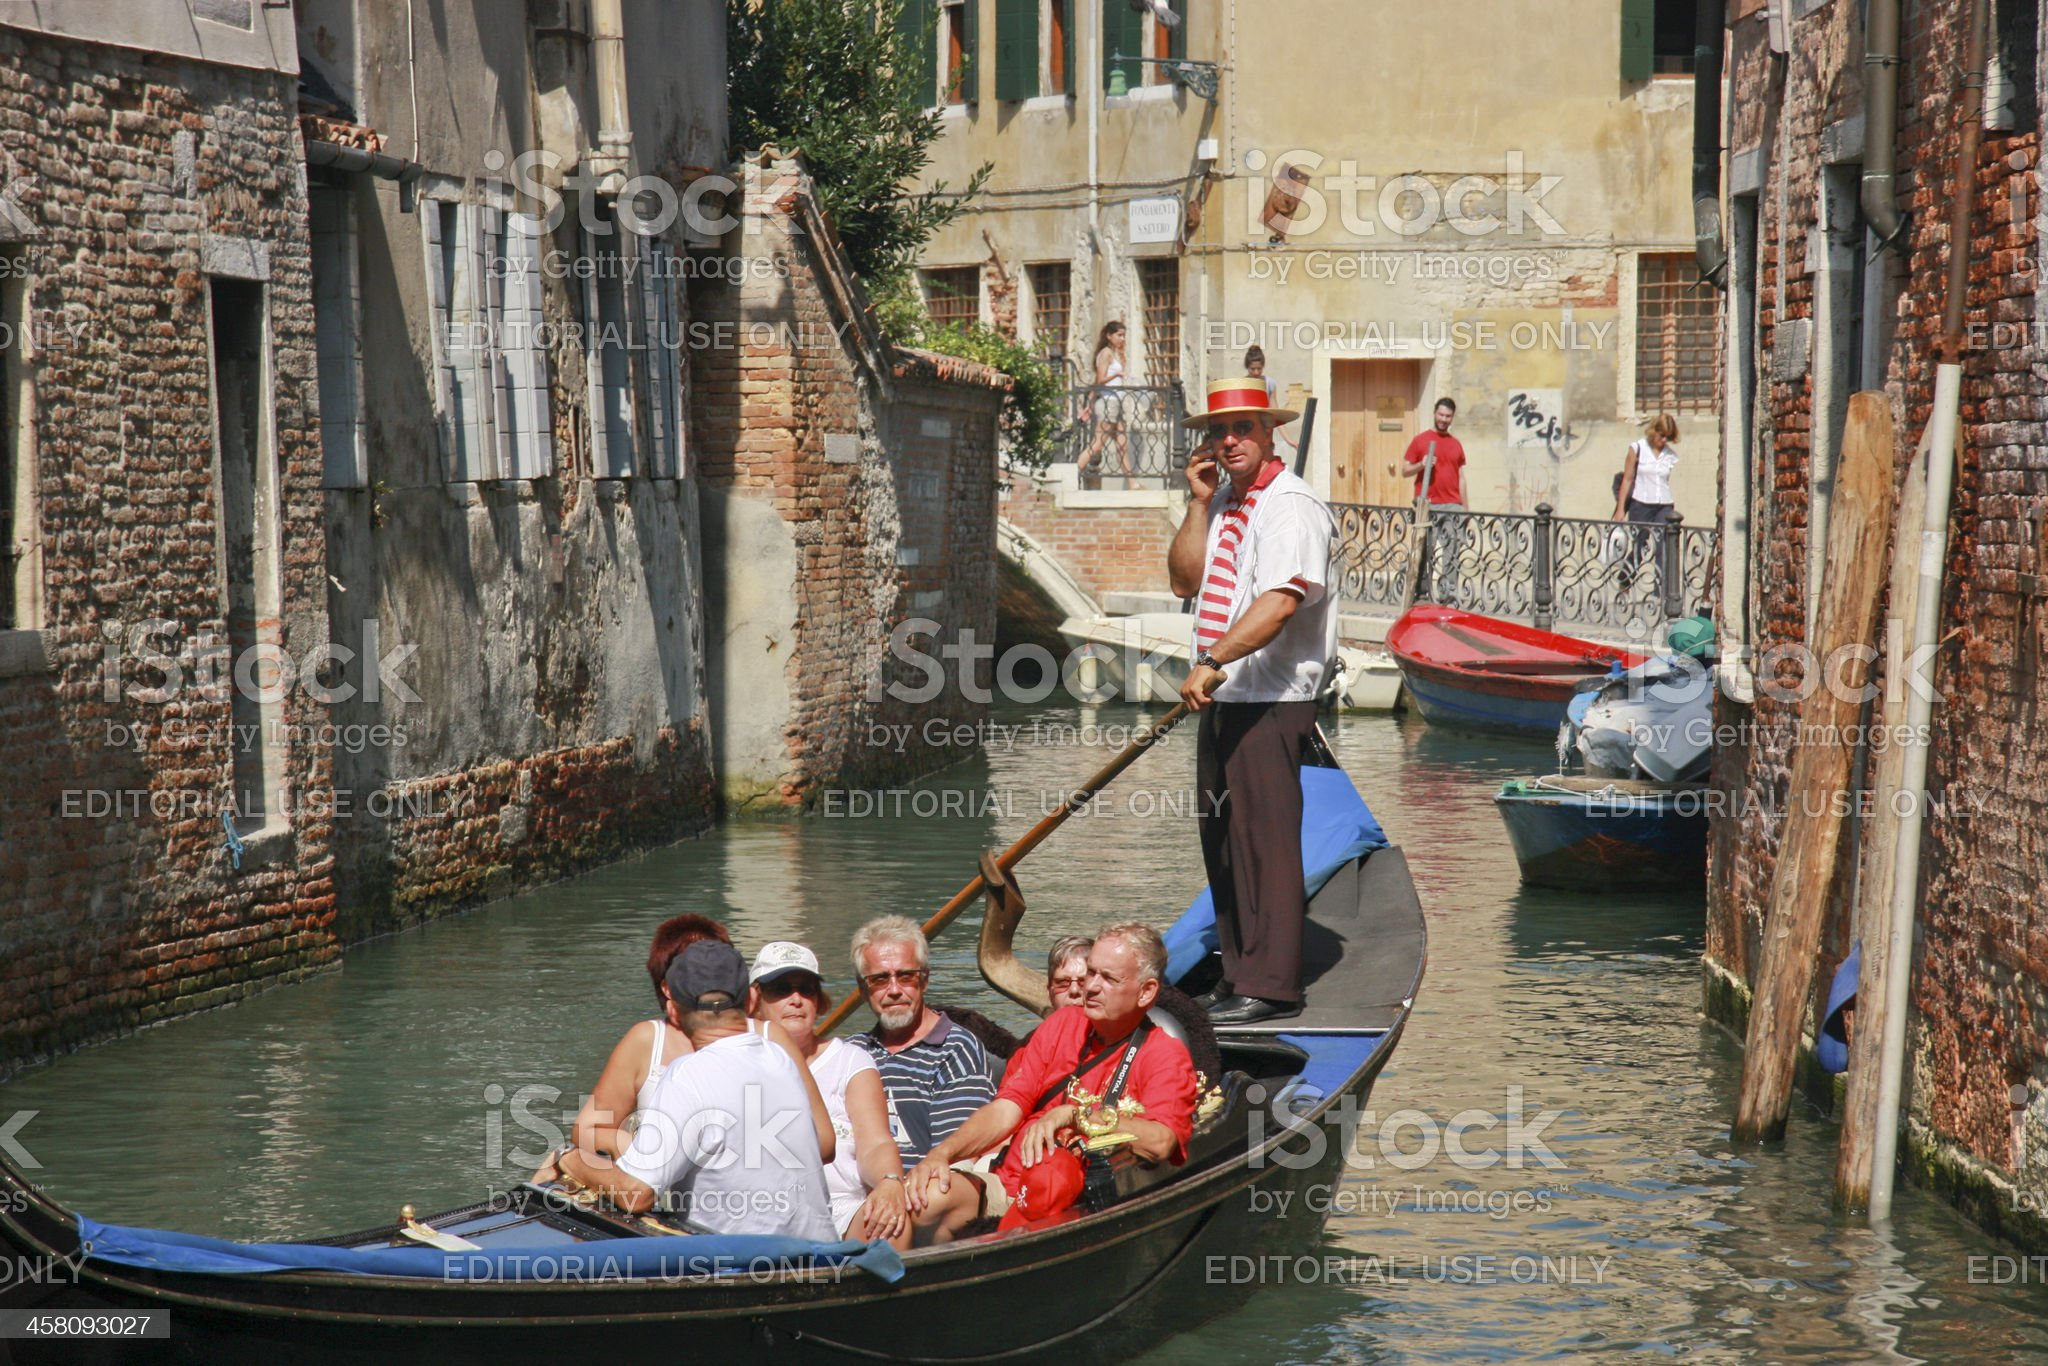 Venetian gondolier rowing gondola speaking to somebody by cellphone royalty-free stock photo